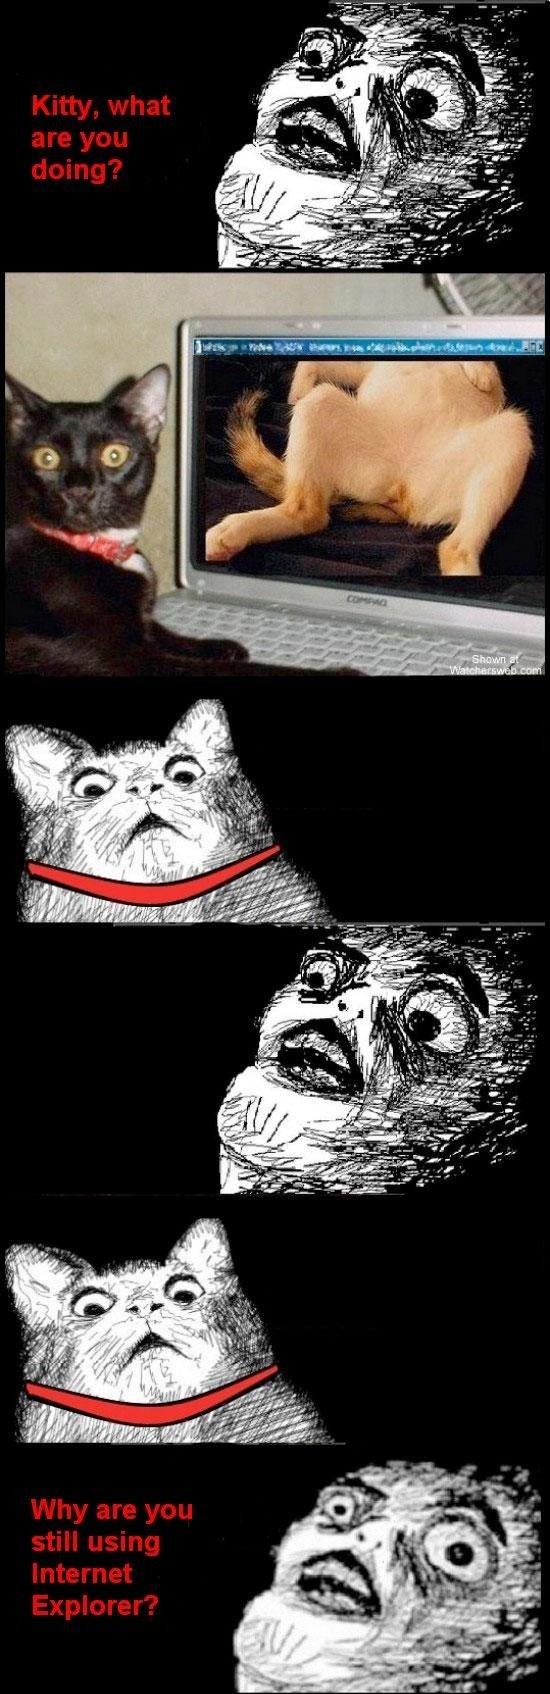 Internut Explorer. Cat porn... on Internet Explorer. cat meme funny Porn internet Explorer